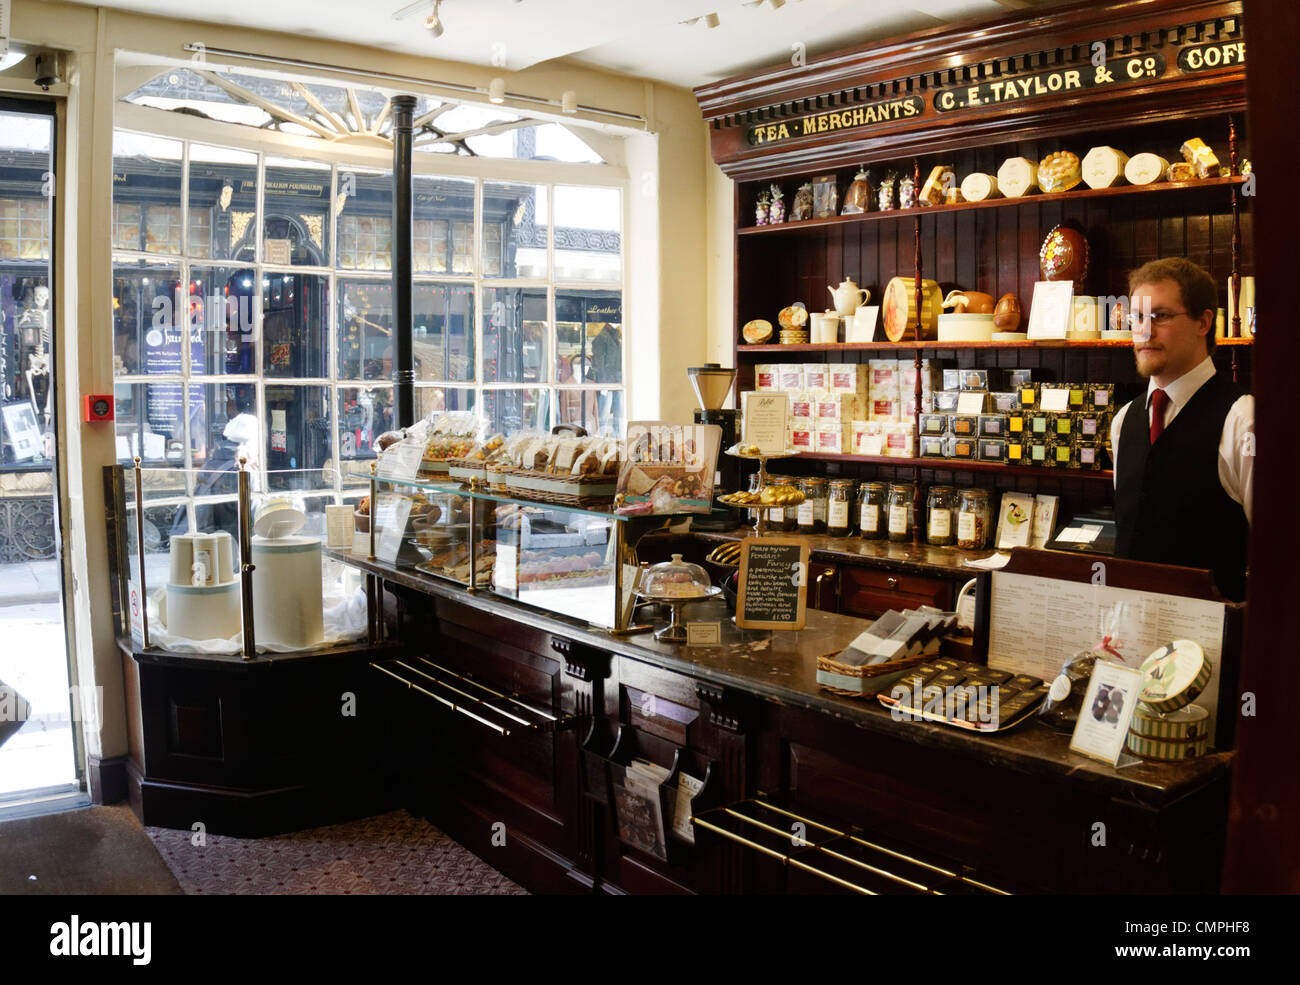 Dentro de las salas de té Bettys tienda en Stonegate, York, REINO UNIDO Imagen De Stock